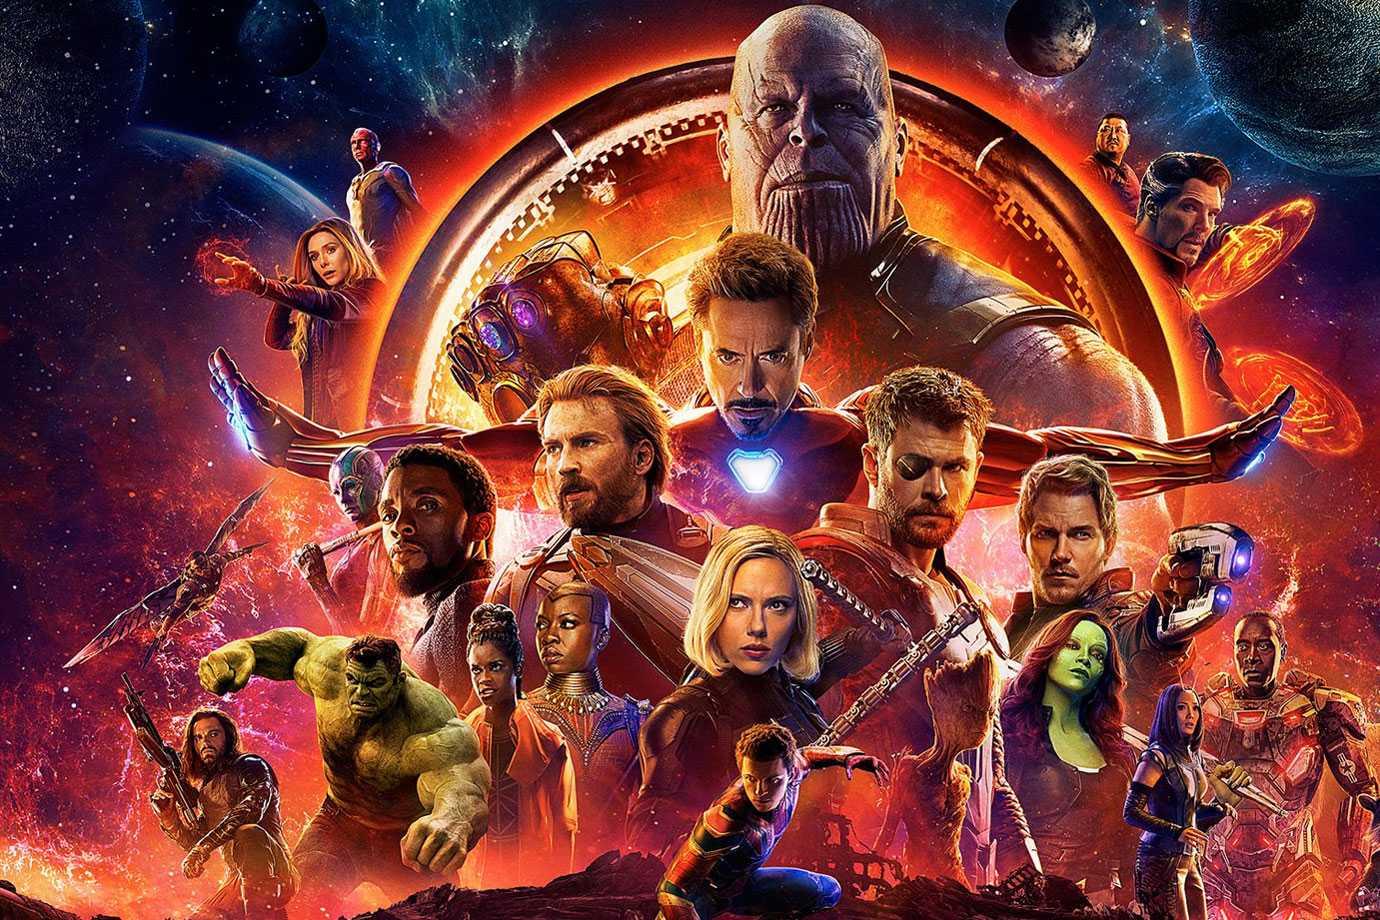 'Vingadores – Guerra Infinita' será exibido gratuitamente no PlayArte do Manauara Shopping